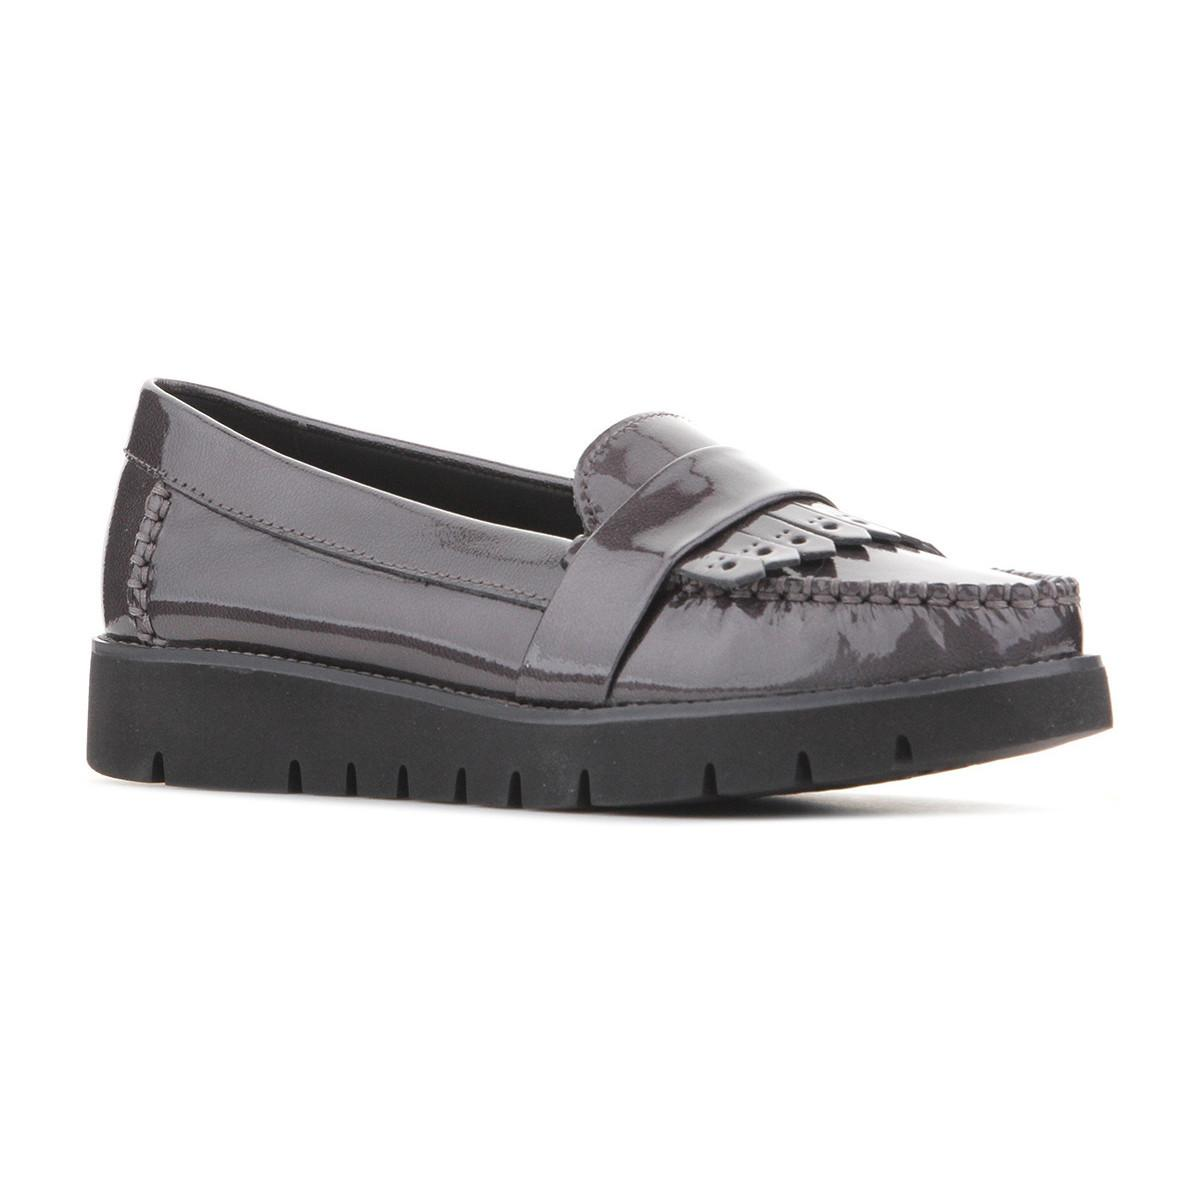 banjo cueva borde  Geox Leather D Blenda C D640bc-000ev-c9002 Women's Casual Shoes In Grey in  Gray - Lyst